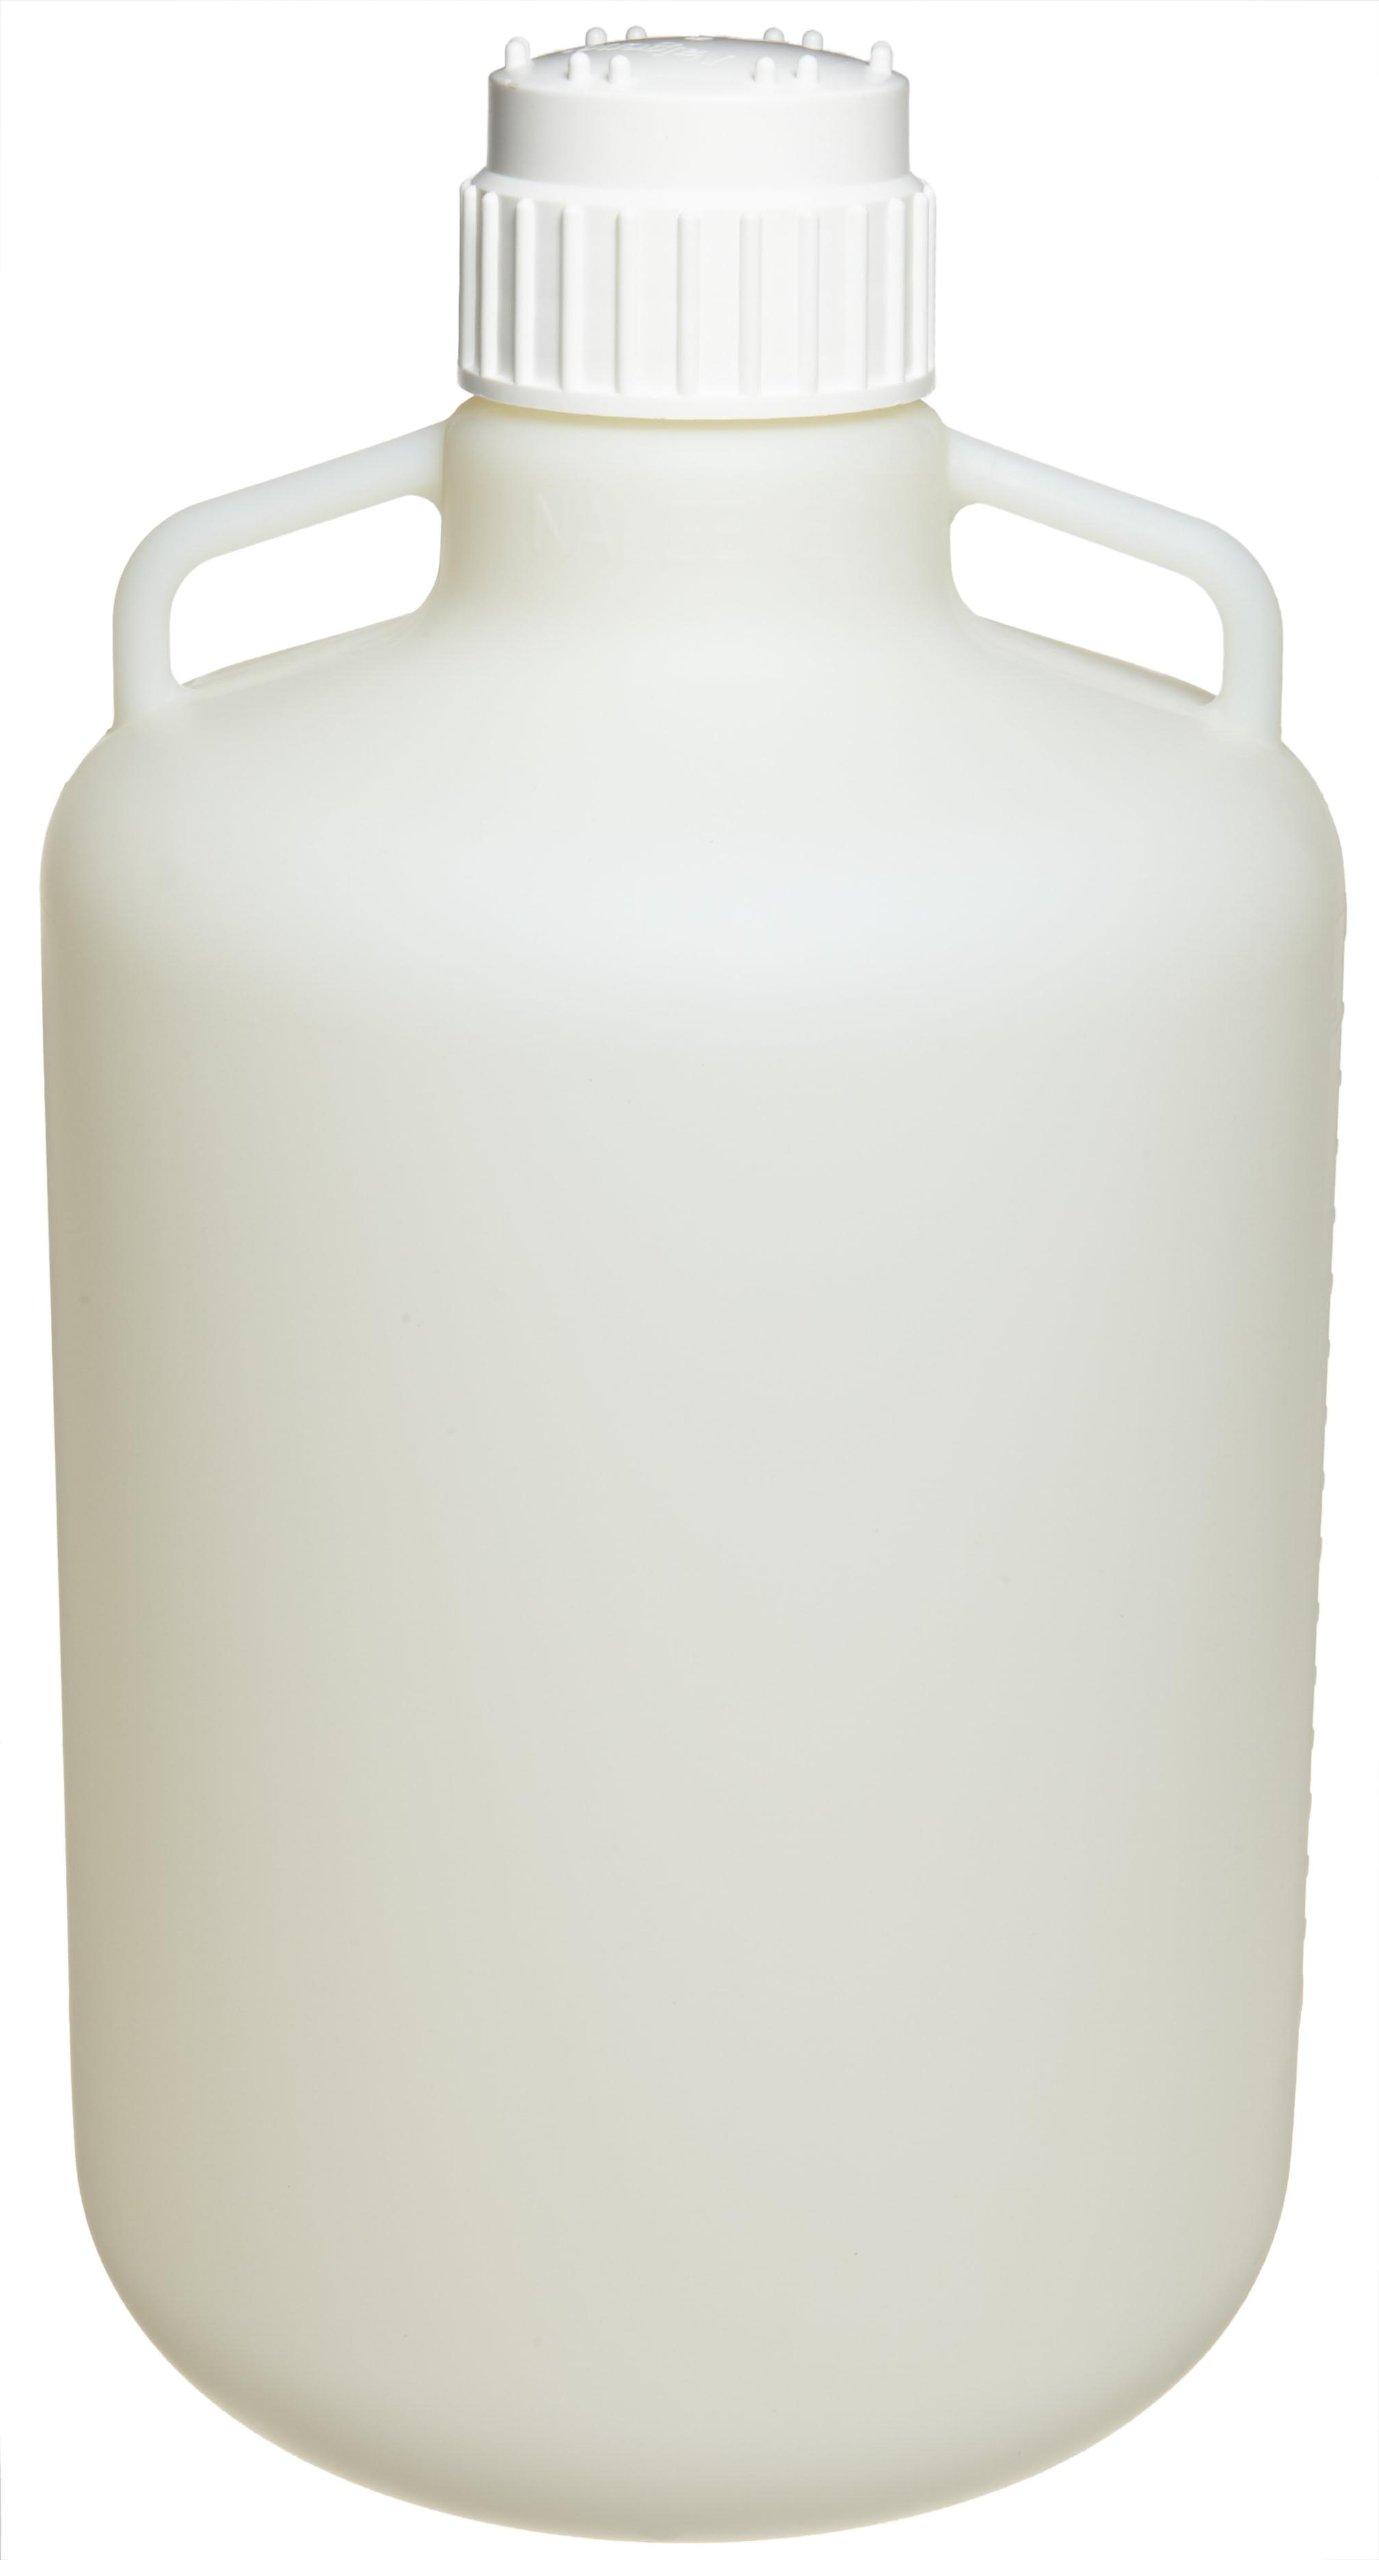 Nalgene 2097-0050 Fluorinated HDPE Carboy with Handle and Polypropylene Screw Closure, 20L Capacity by Nalgene